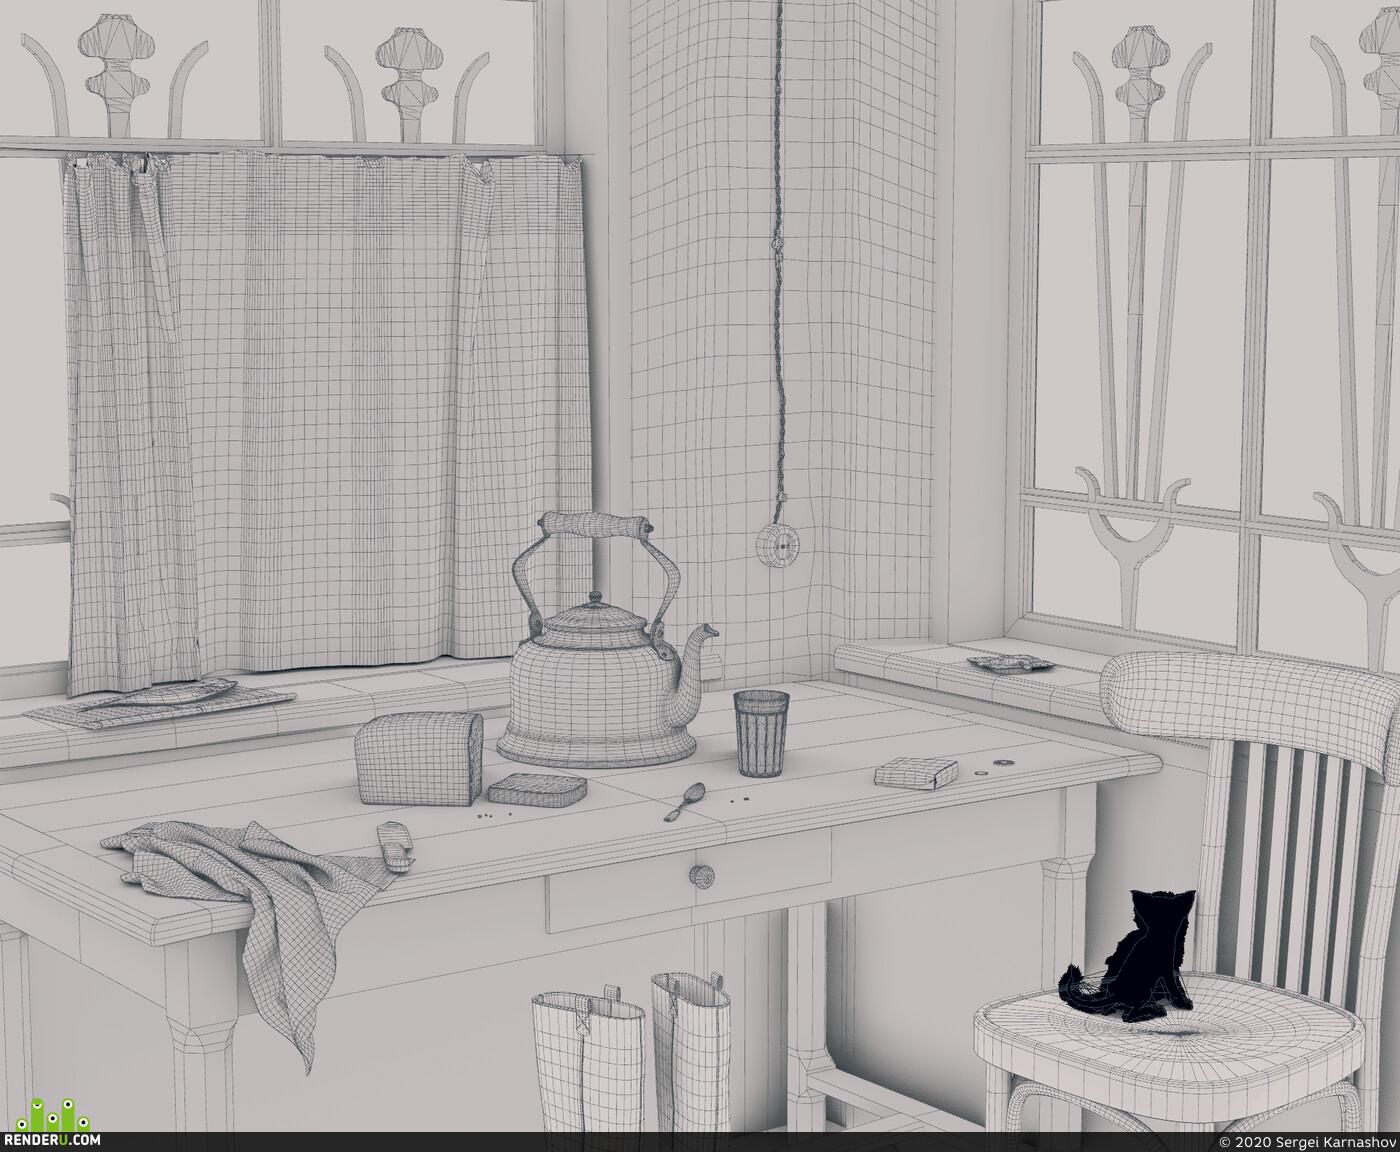 Визуализация, интерьер, Blender, cycles